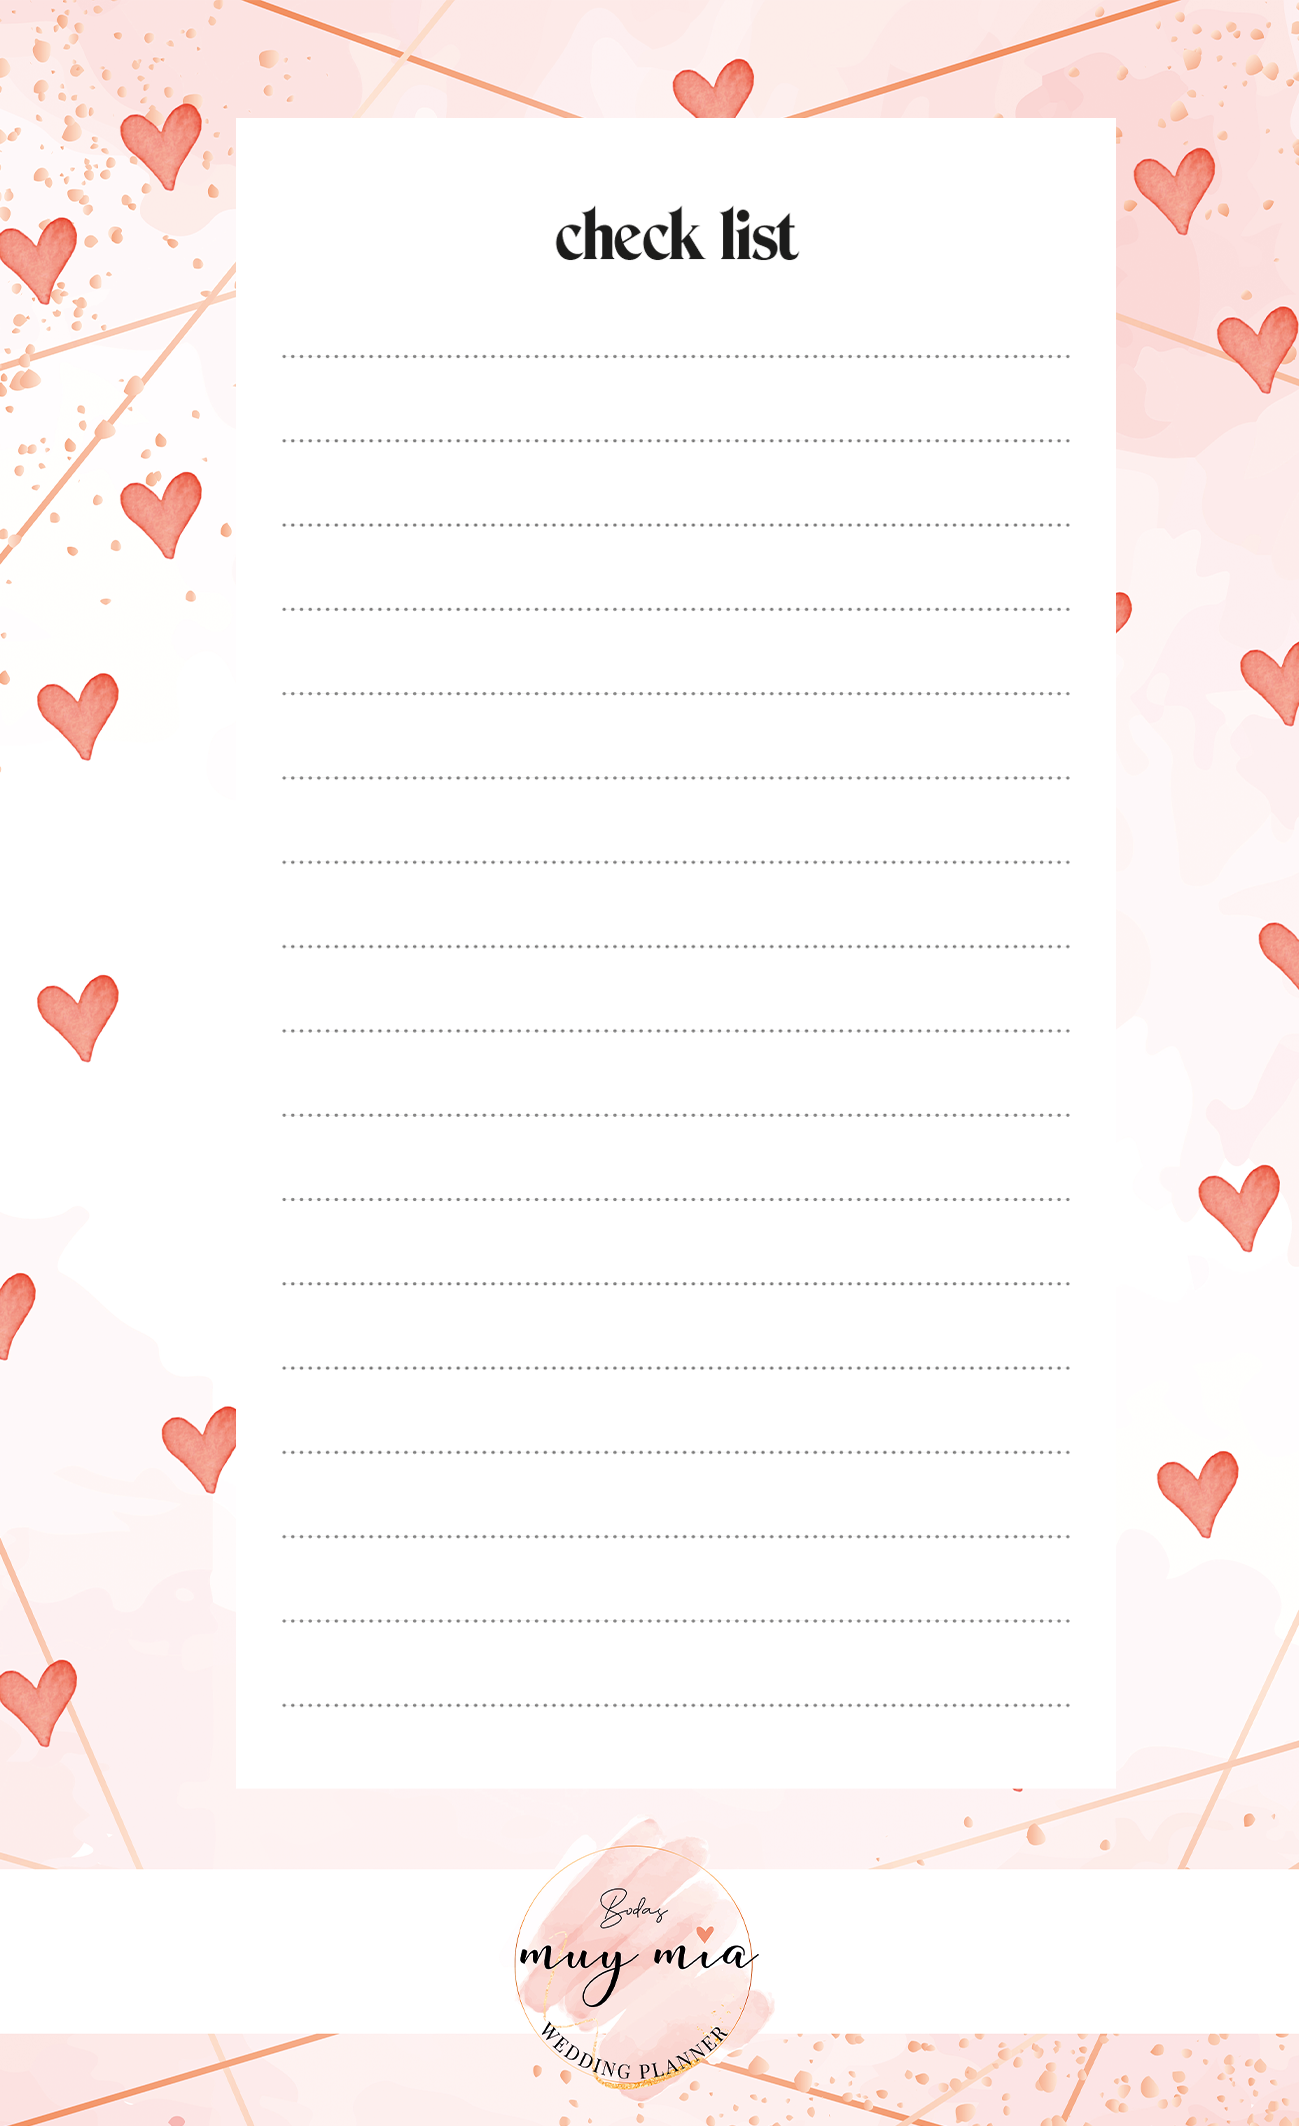 0. Checklist